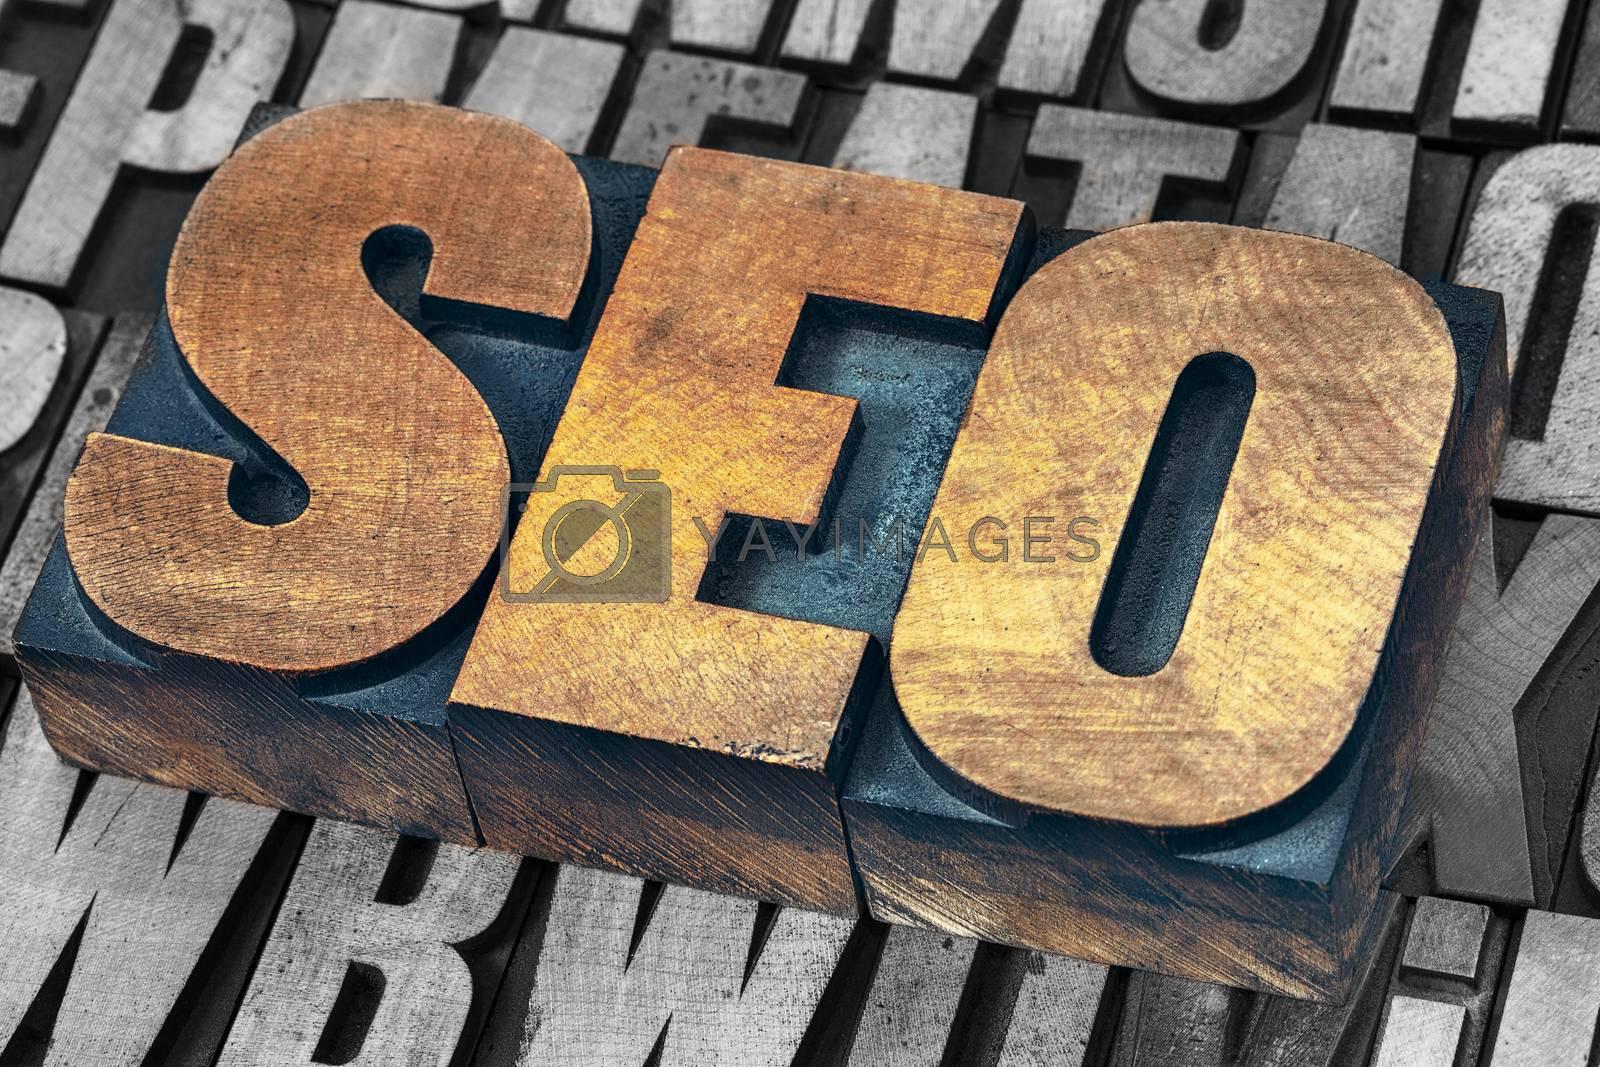 SEO (search engine optimization) acronym - text in vintage grunge letterpress wood type